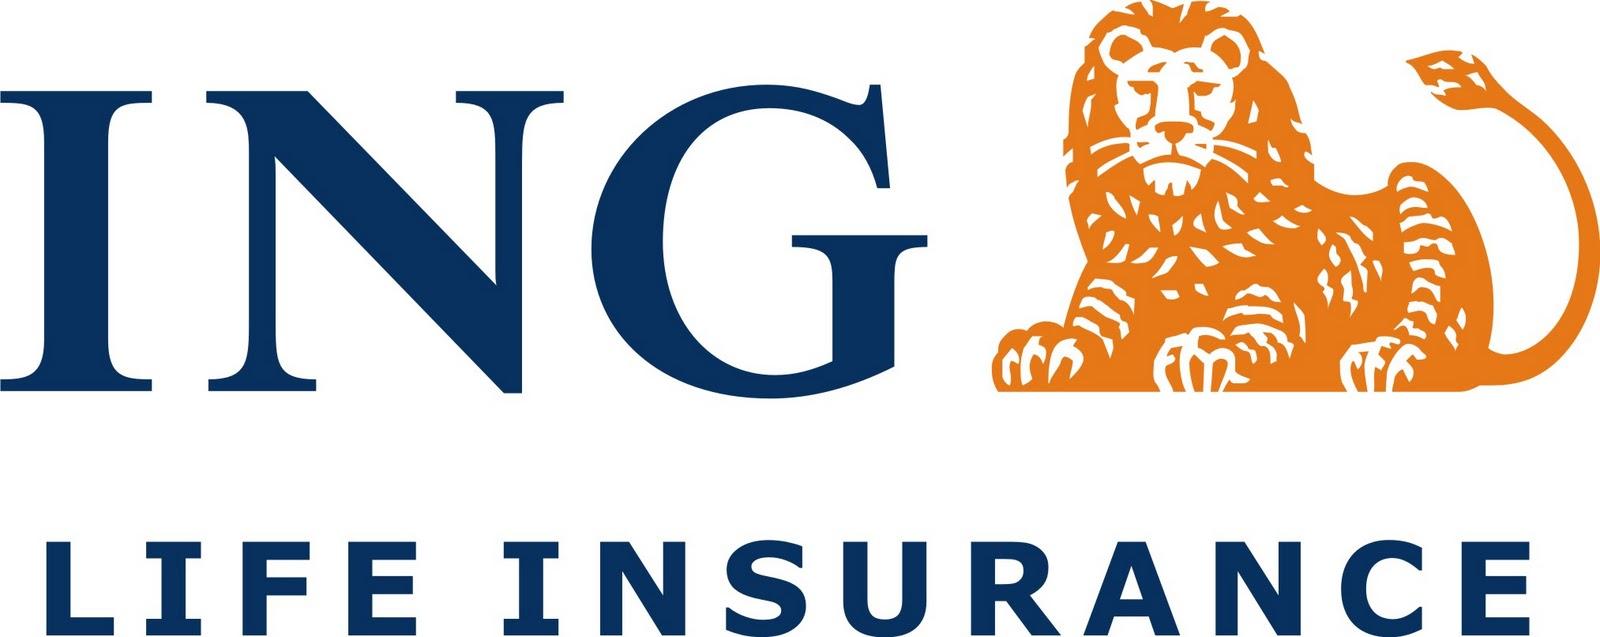 umbrella personal liability insurance - Invest Definition